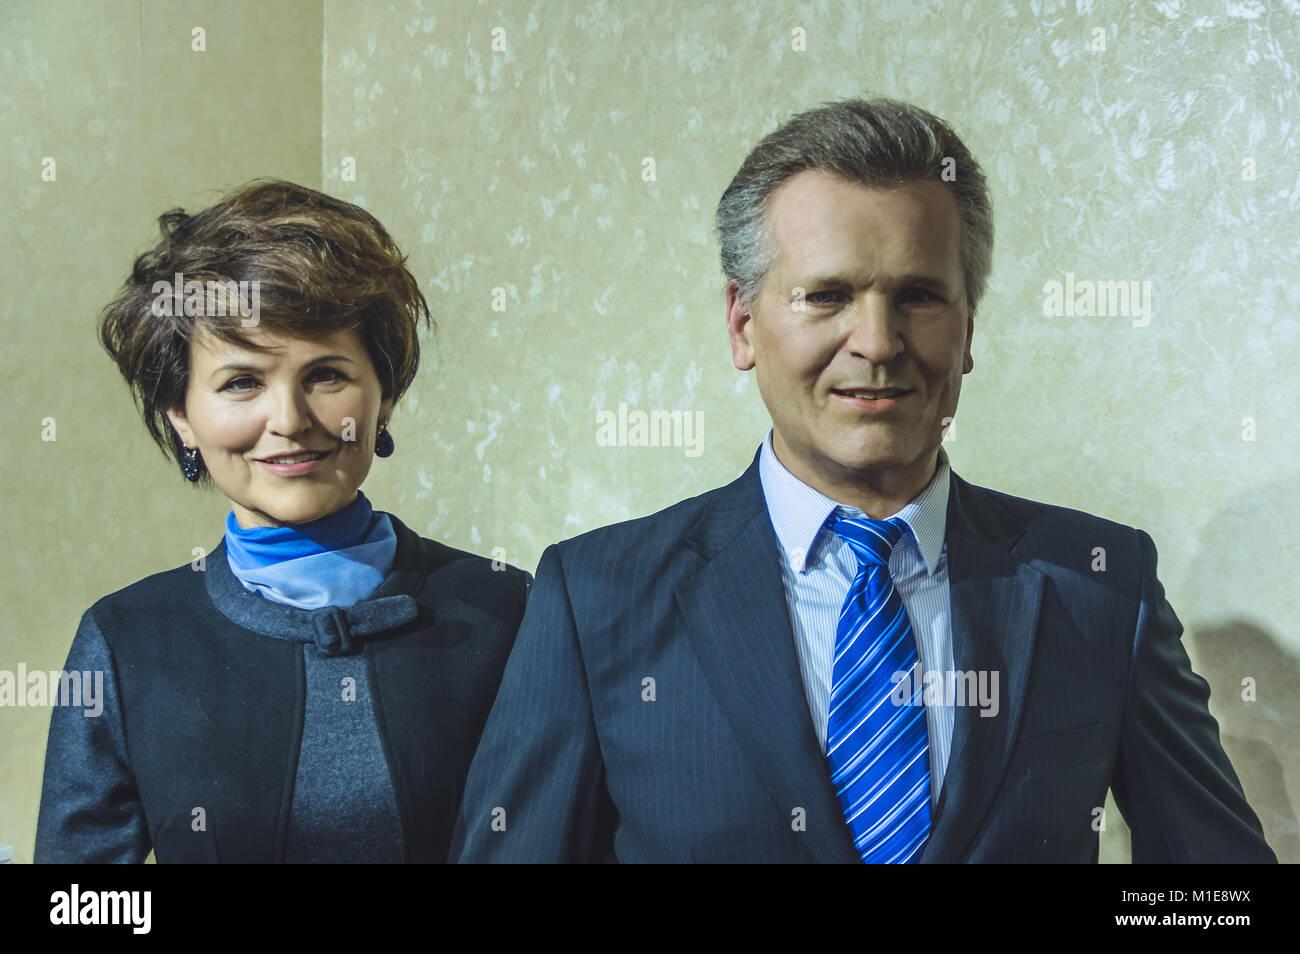 Wax statues of Aleksander Kwasniewski, former President of the Republic of Poland and Jolanta Kwasniewska at the - Stock Image